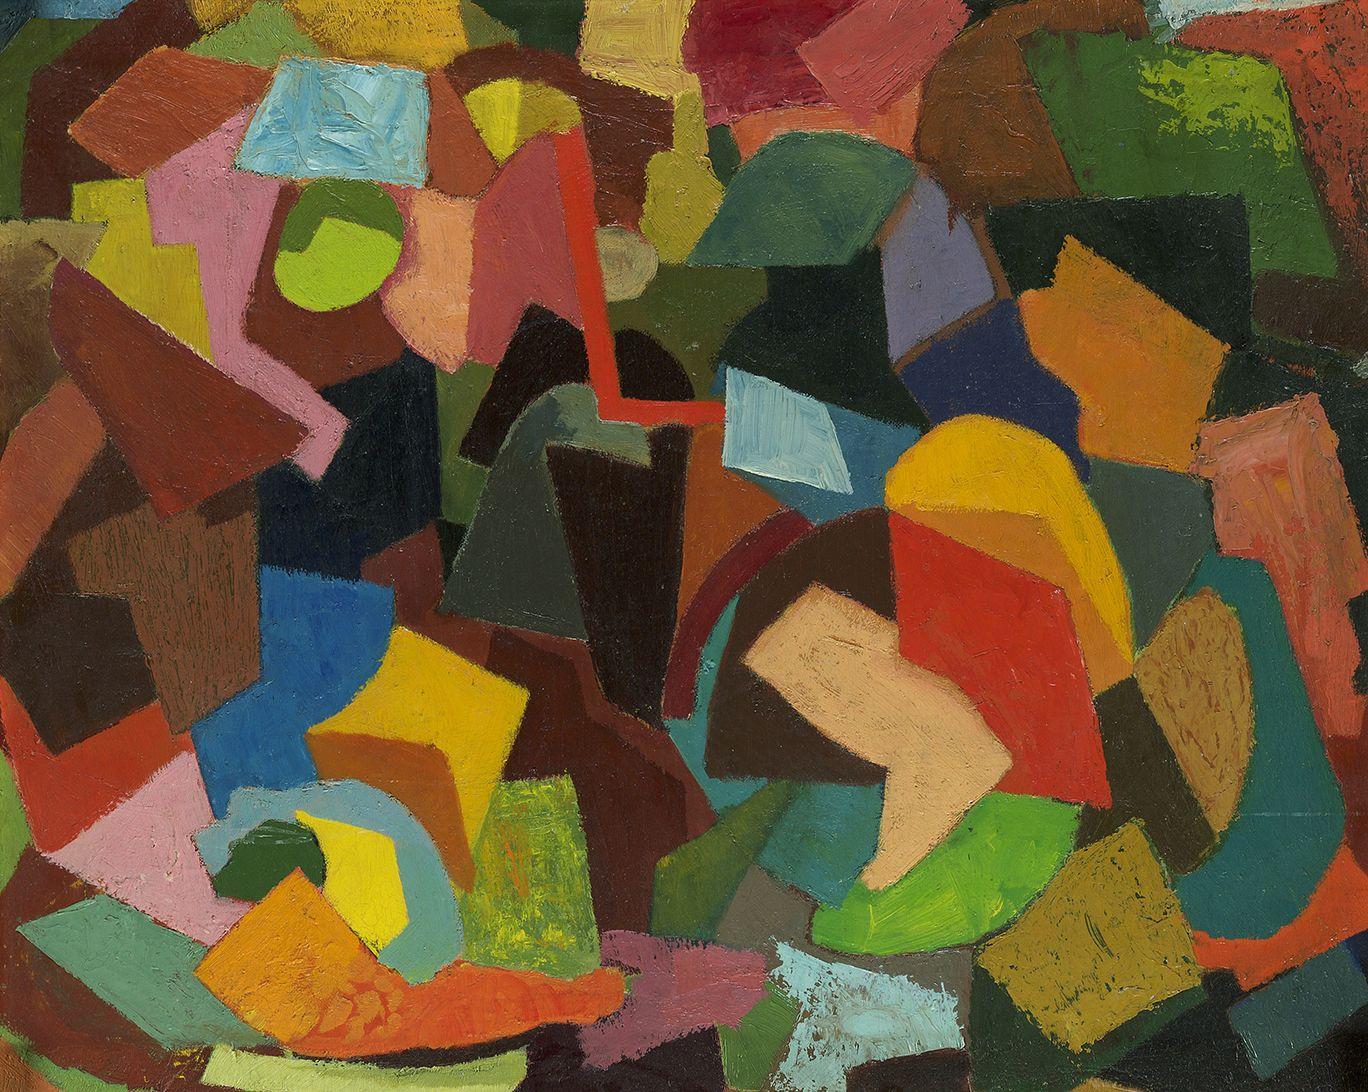 Wilfred Zogbaum (1915-1965), Untitled, circa 1935